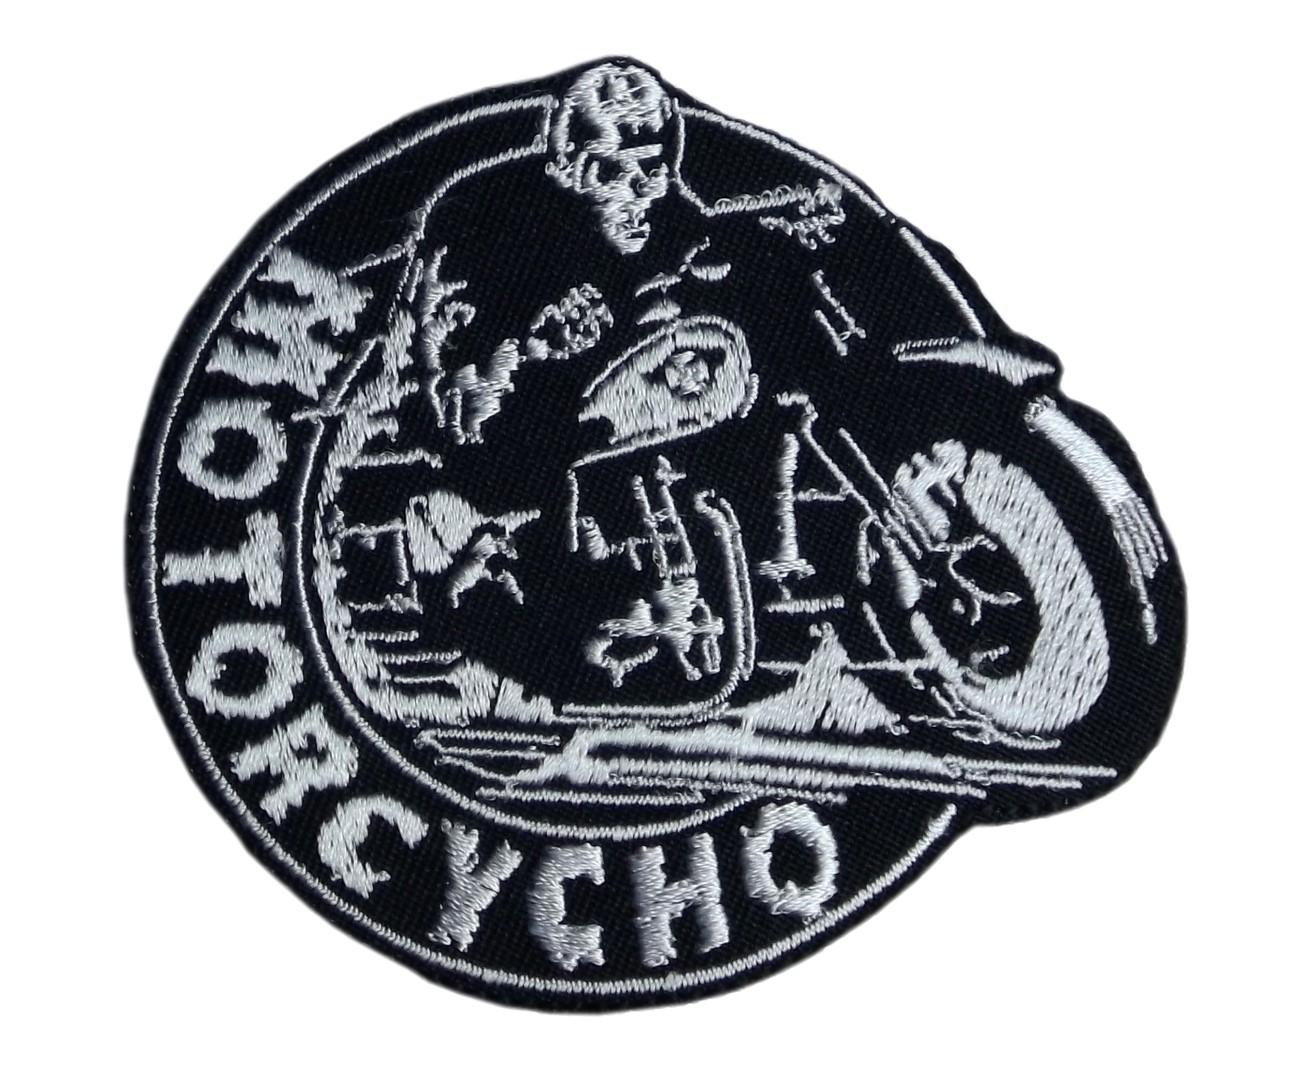 patch_iron_motorcycho_biker_rocker_mc_8cm_9cm_3_15_inch_3_54_inch_badges_2.jpg